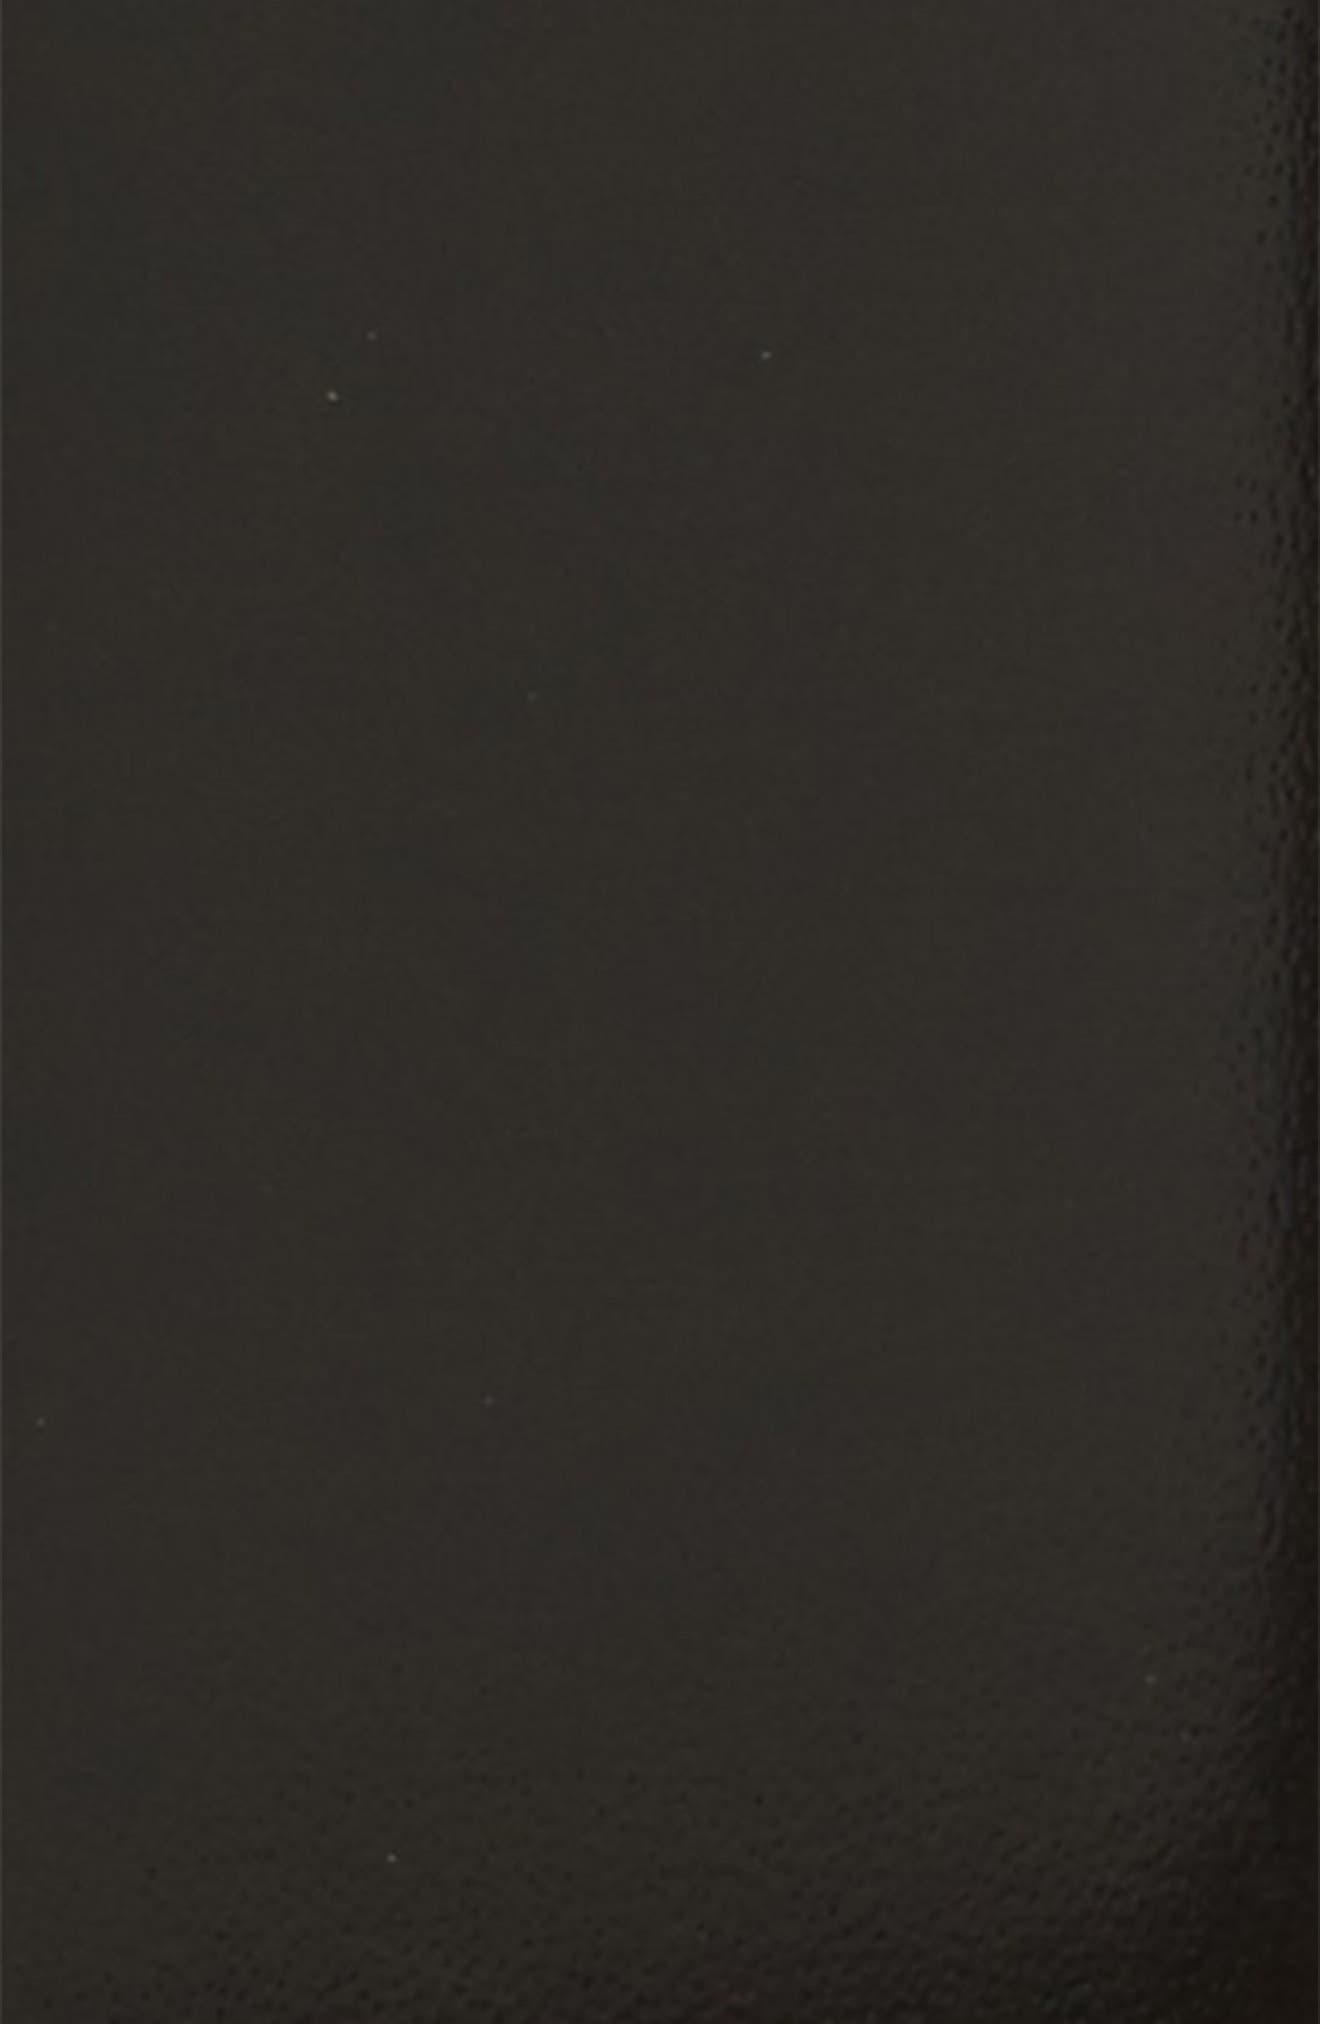 Reversible Leather Belt,                             Alternate thumbnail 3, color,                             Black/ Cuoio